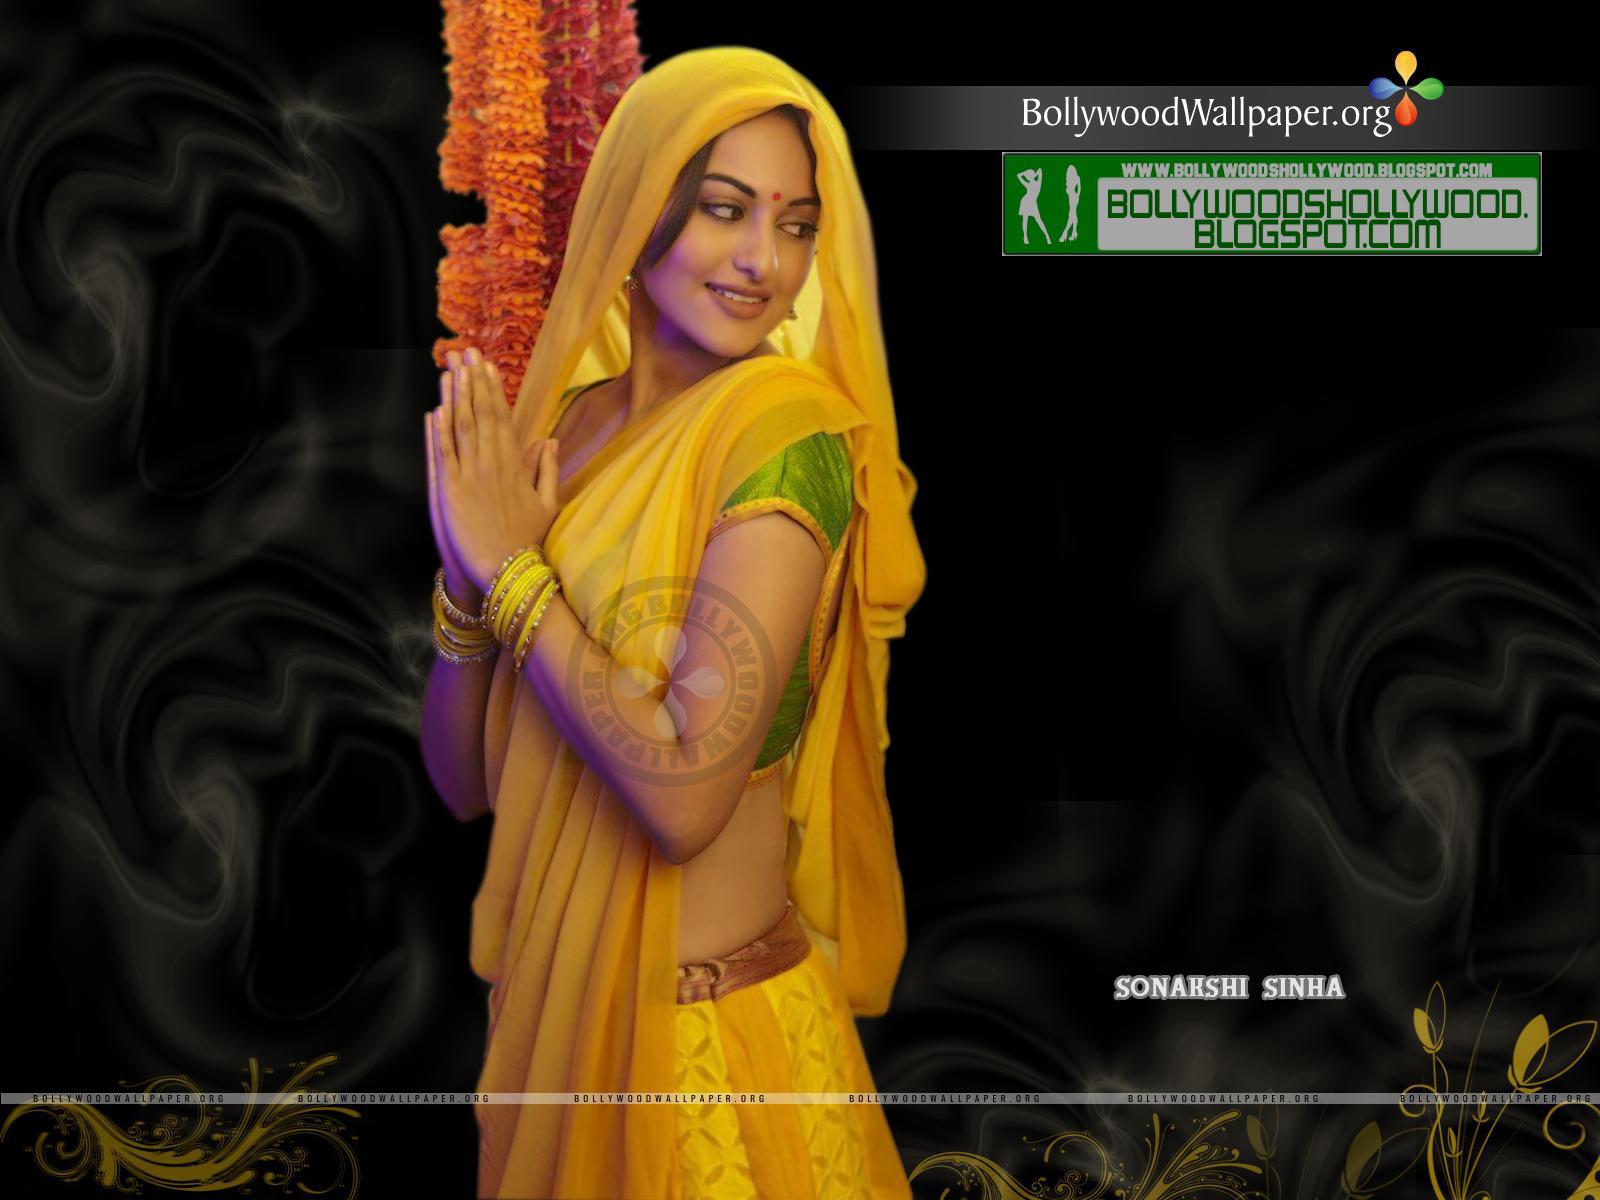 http://1.bp.blogspot.com/-4Oa9v5mojjE/TeqRXsje5_I/AAAAAAAAI-Q/1m-ULY7obg4/s1600/Sonakshi-Sinha-Wallpaper-003.jpg